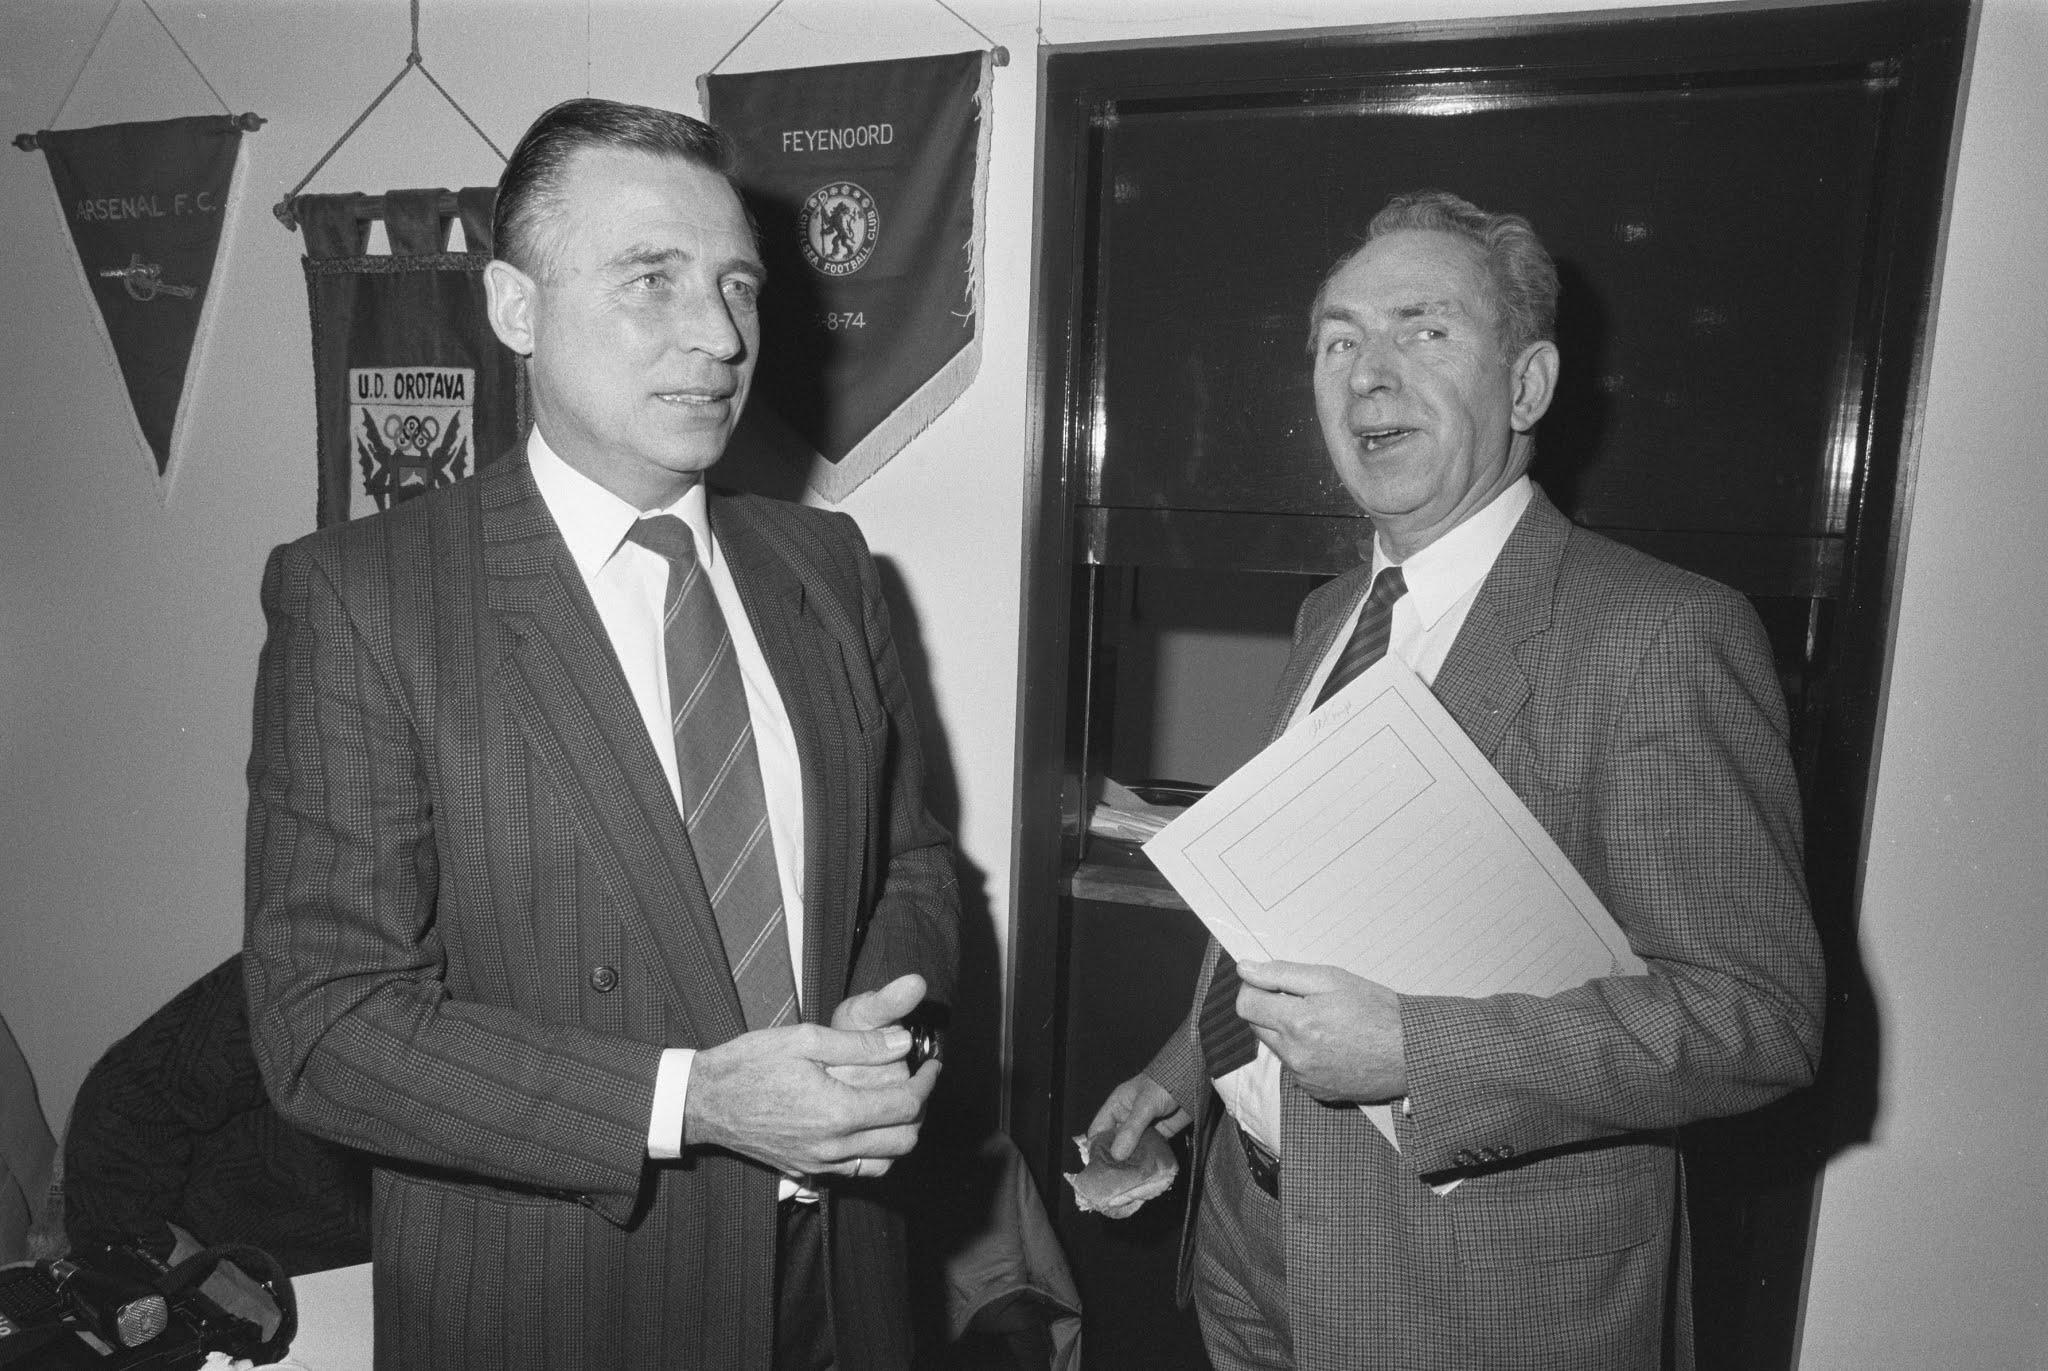 Feyenoord-voorzitter Gerard Kerkum en Stadiondirecteur Frits de Kimpe